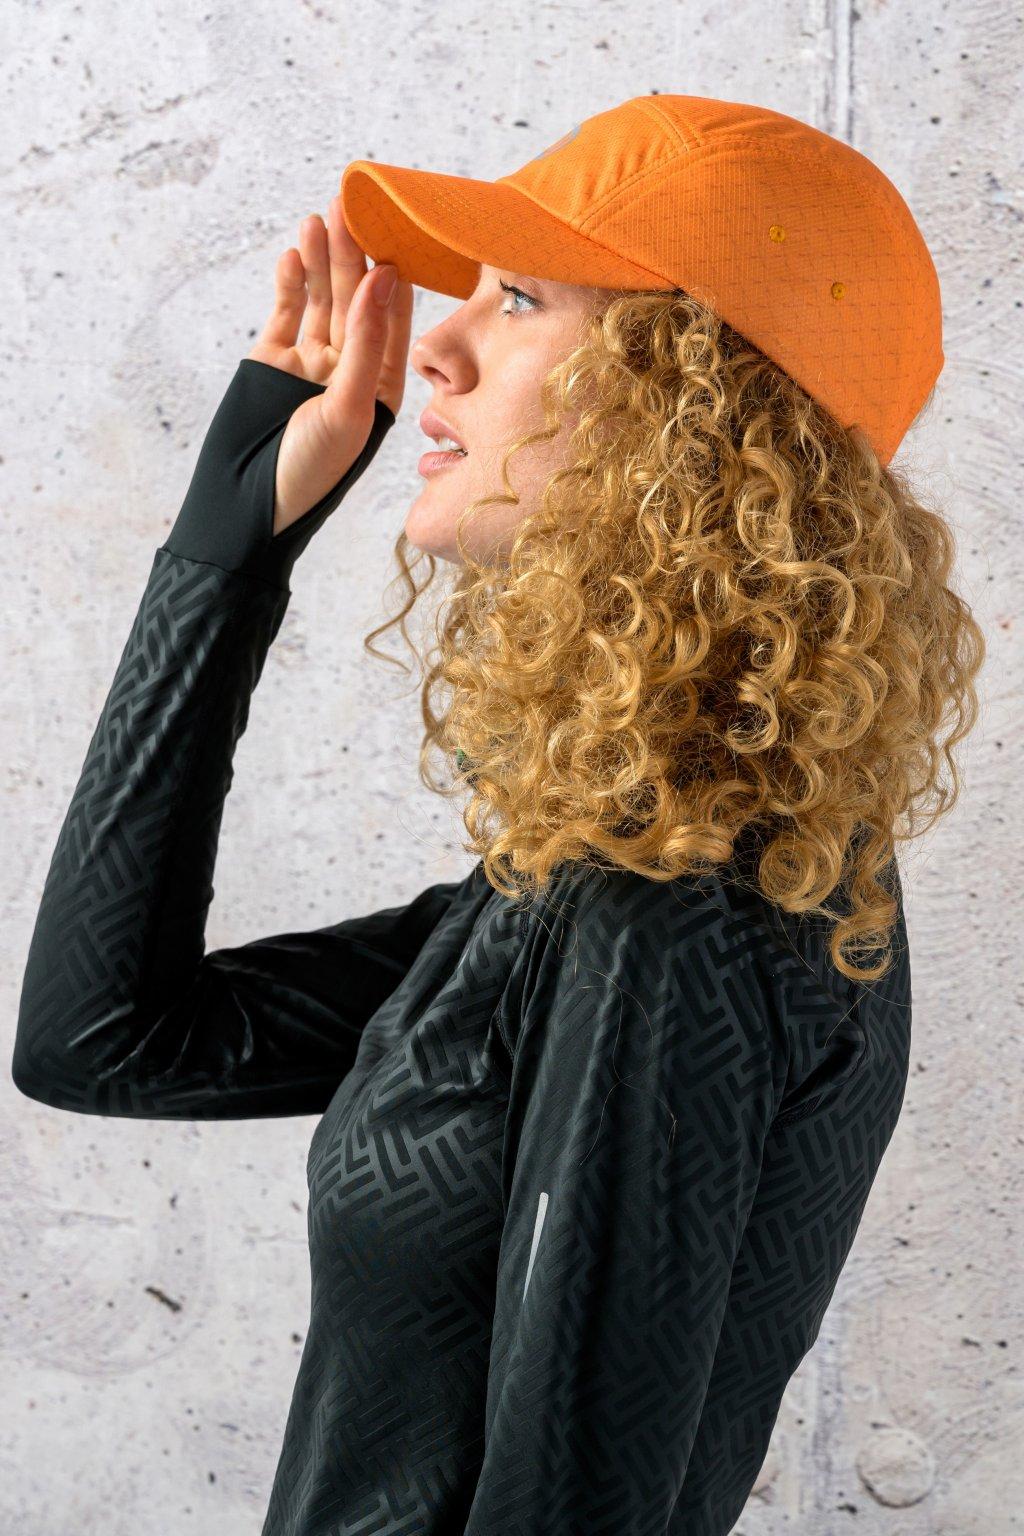 nepromokavá kšiltovka orange mirage cmb 11x3 1